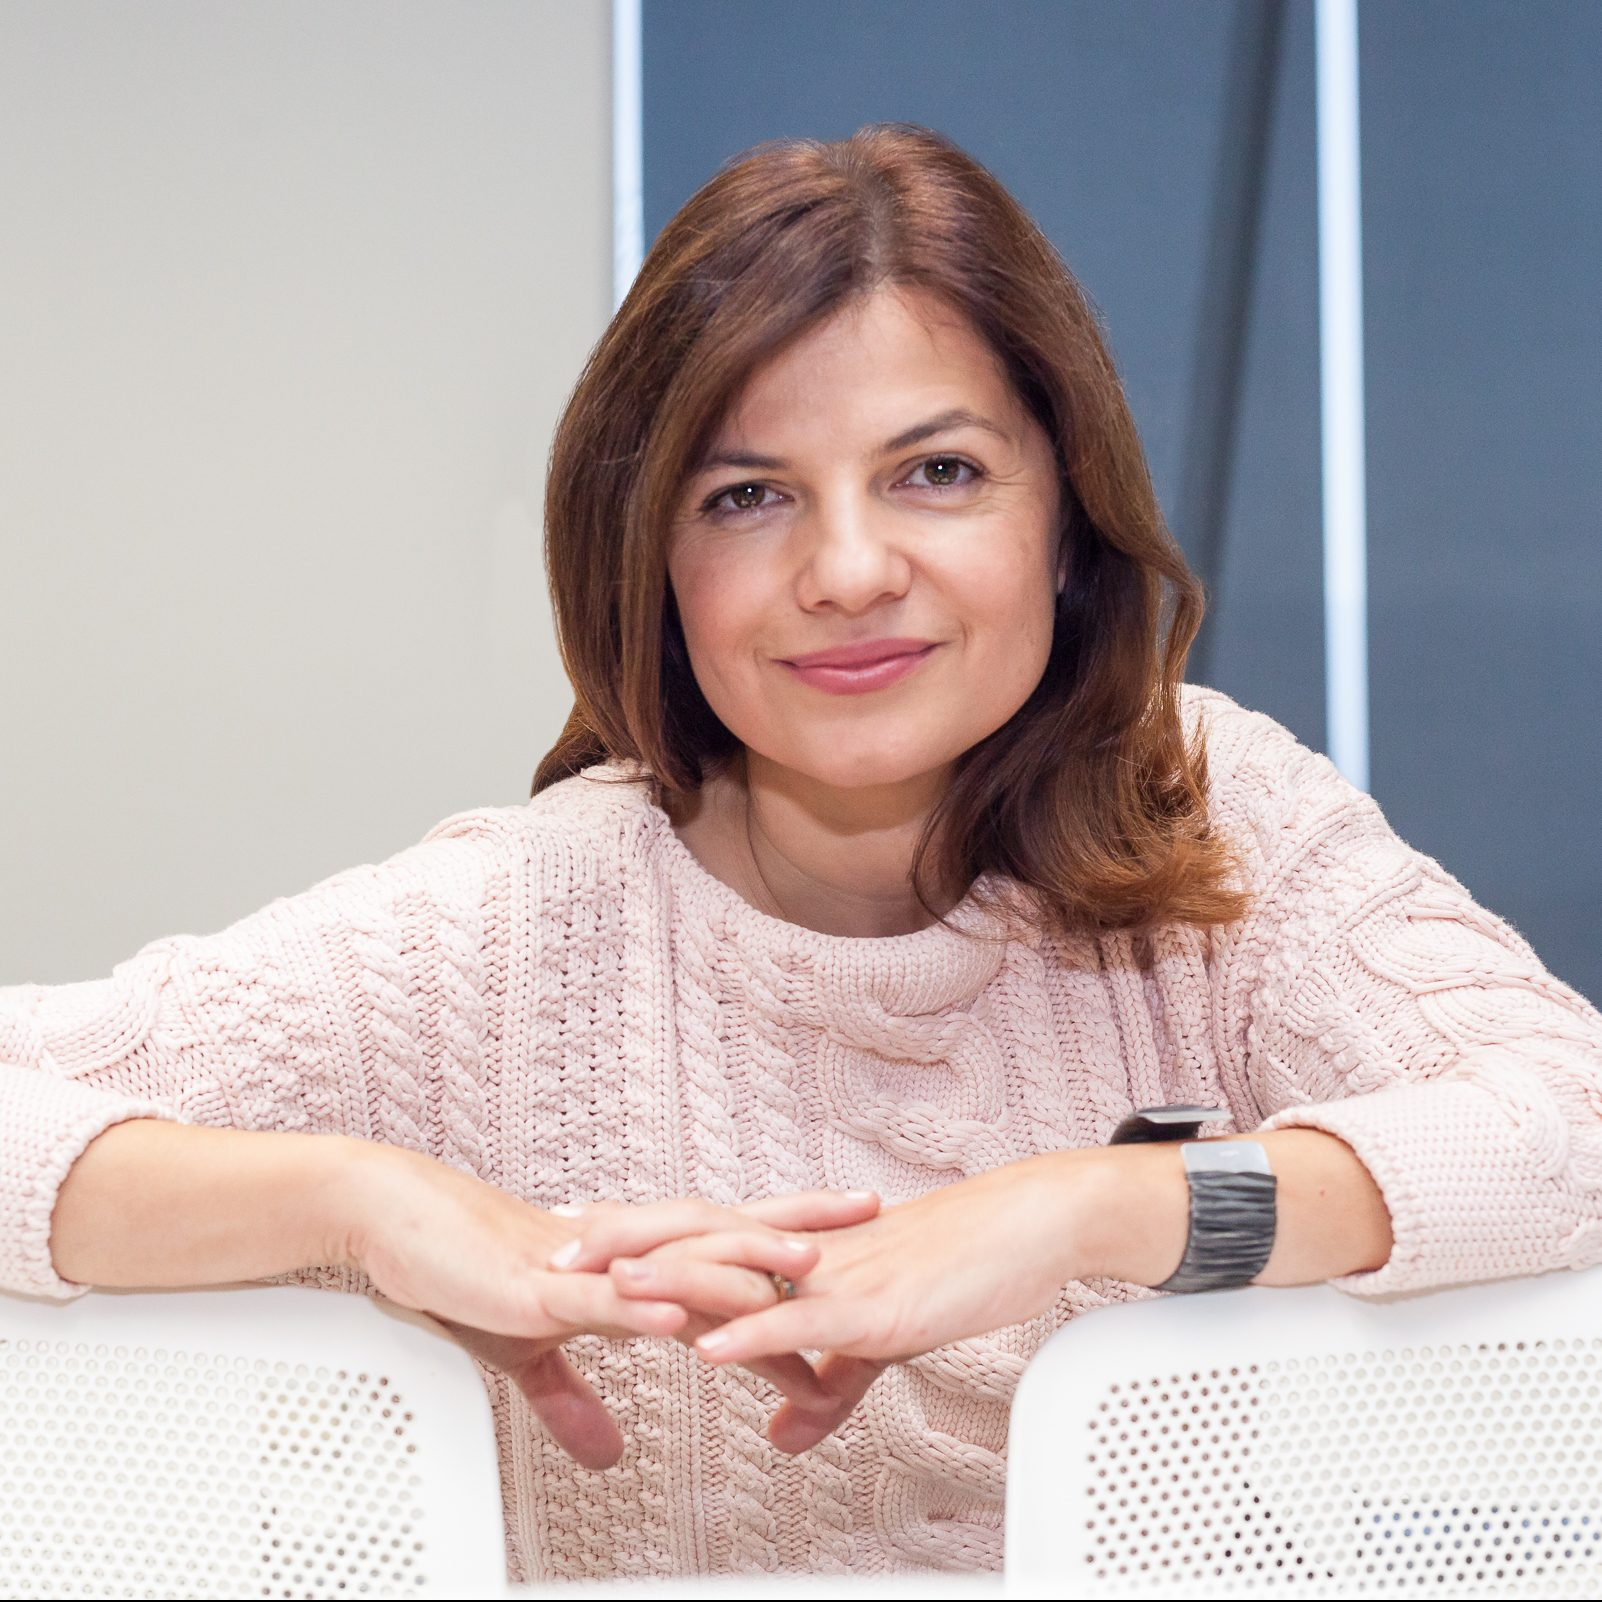 mag. Sonja Šmuc